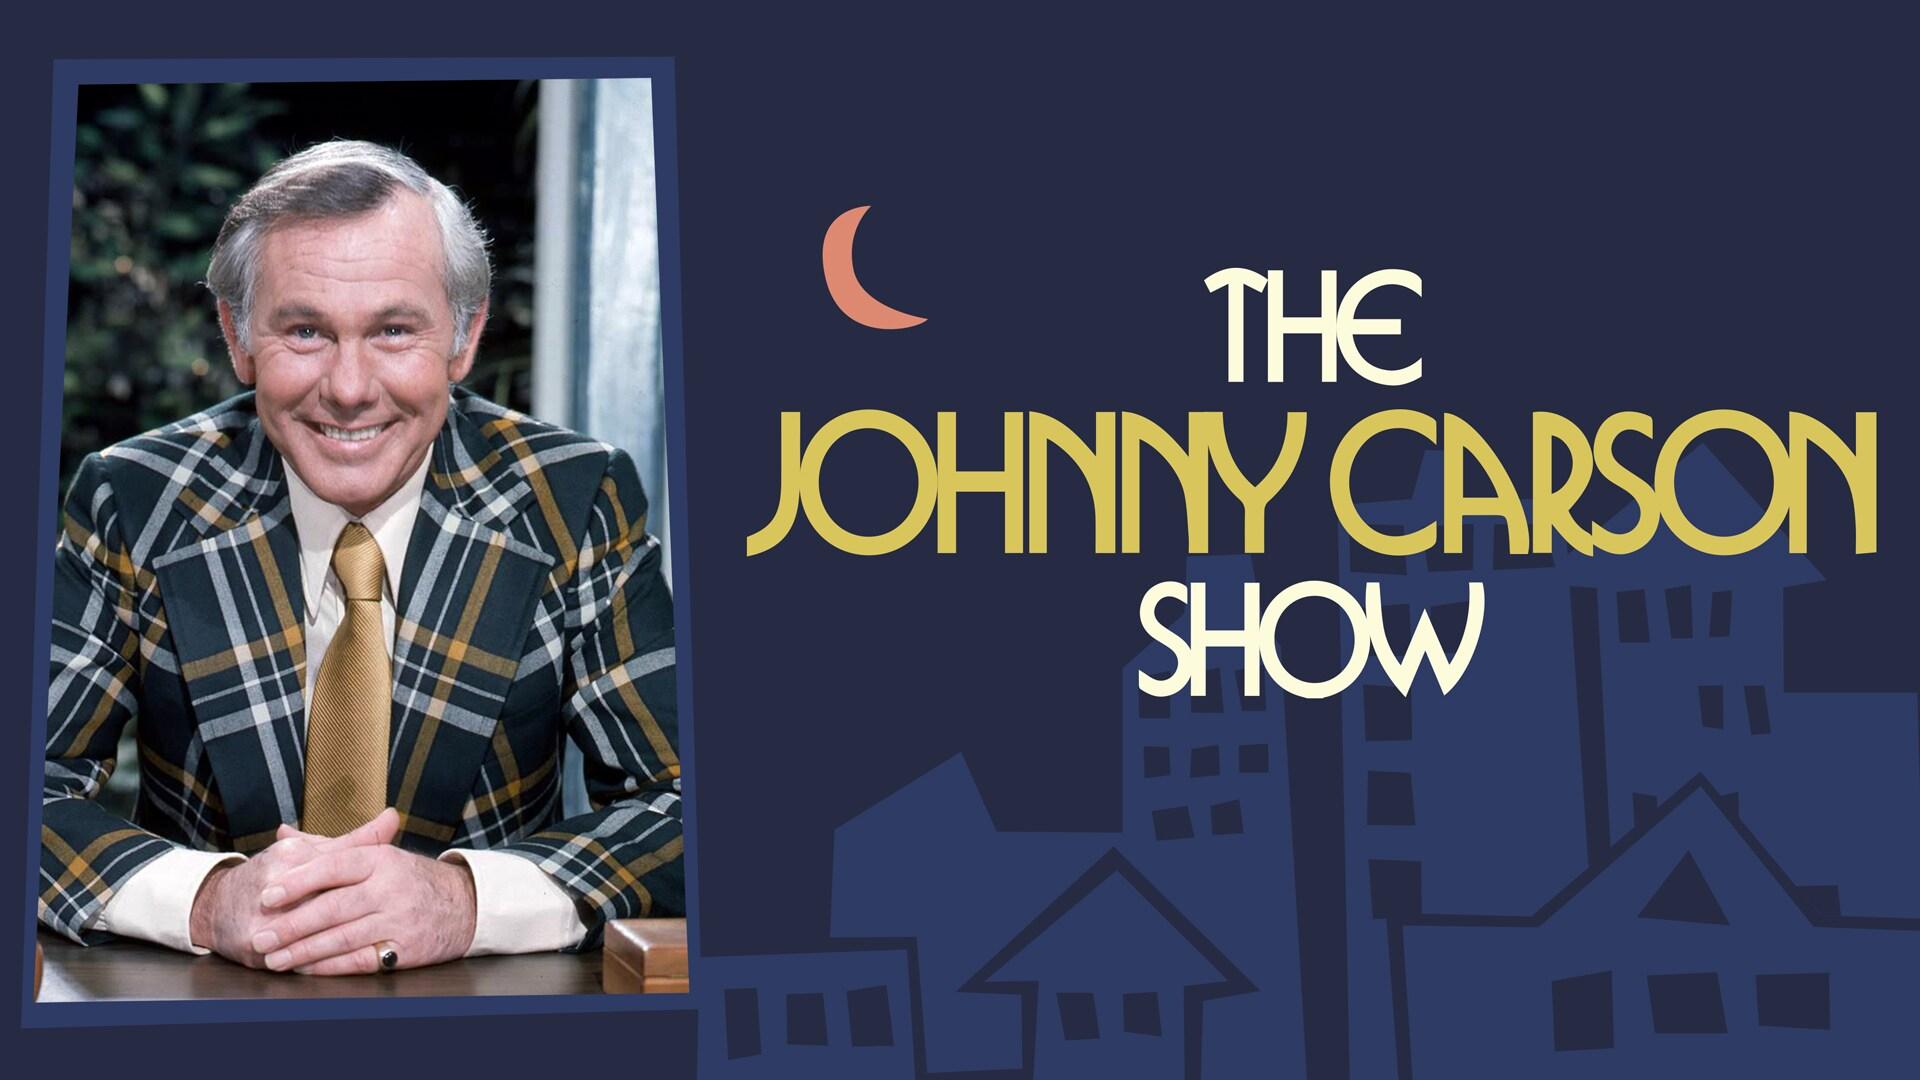 The Johnny Carson Show: Animal Antics With Joan Embery (8/15/91)